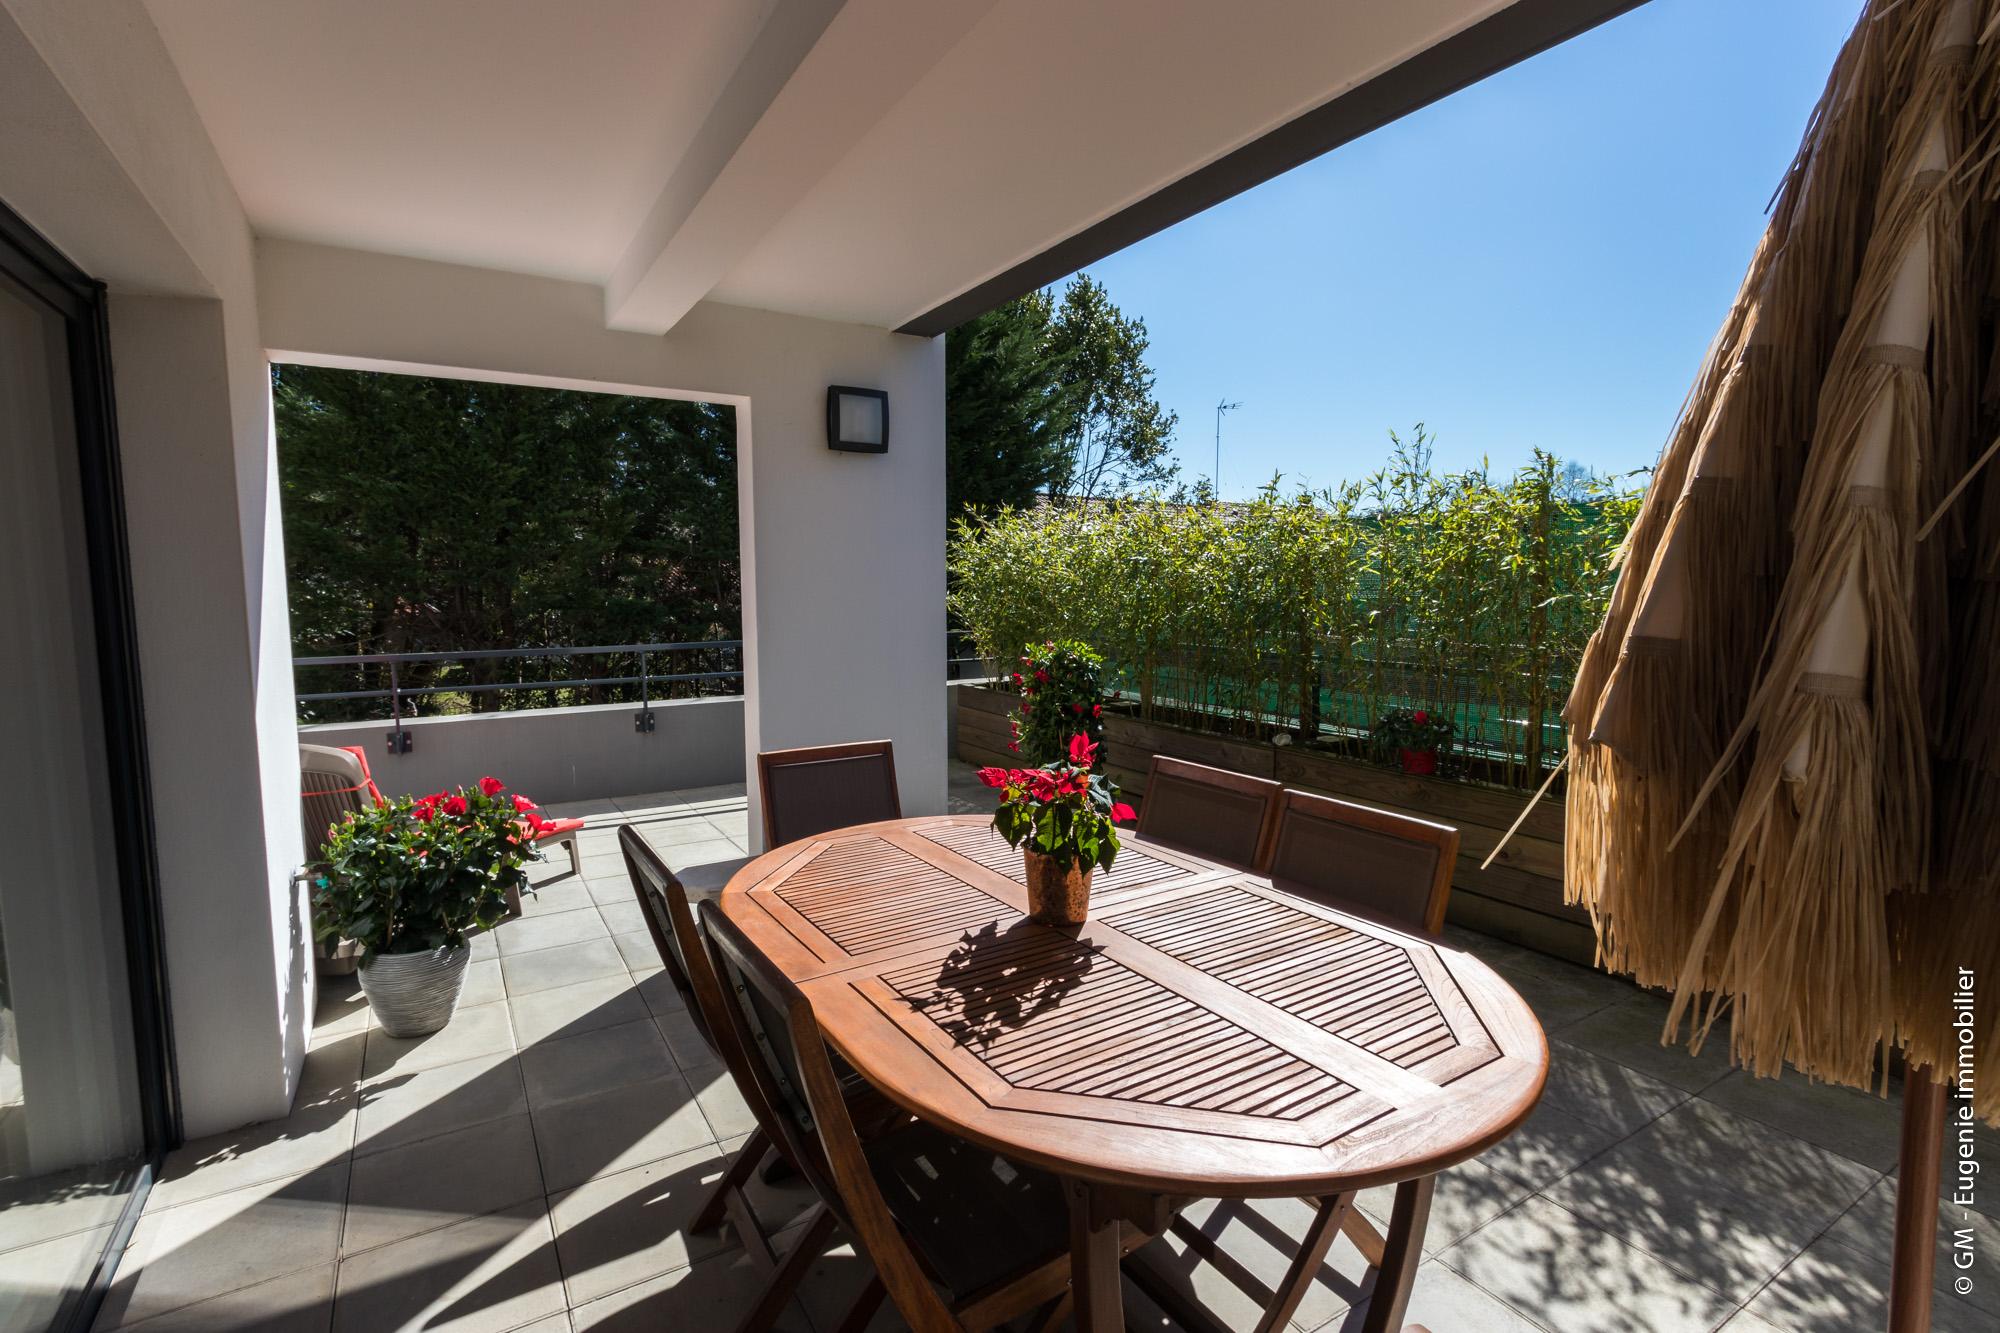 Appartement T3 64m² + Terrasse 52m² au calme